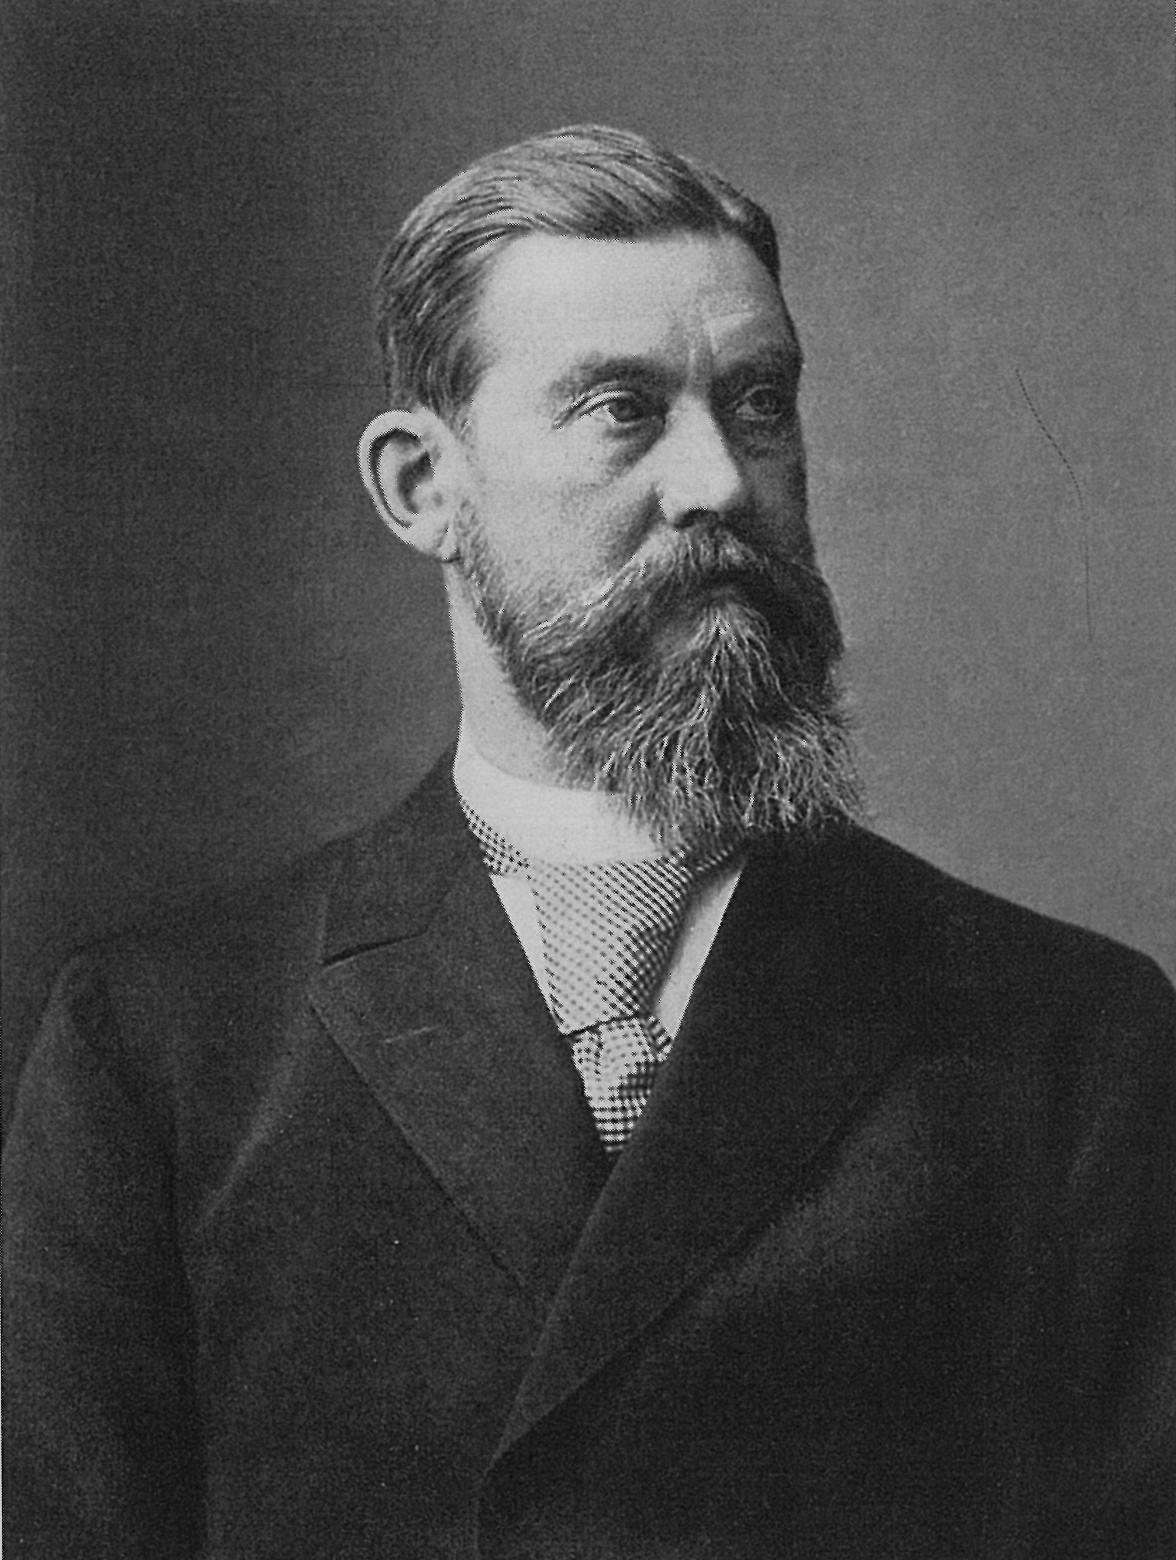 Bernhard Danckelmann